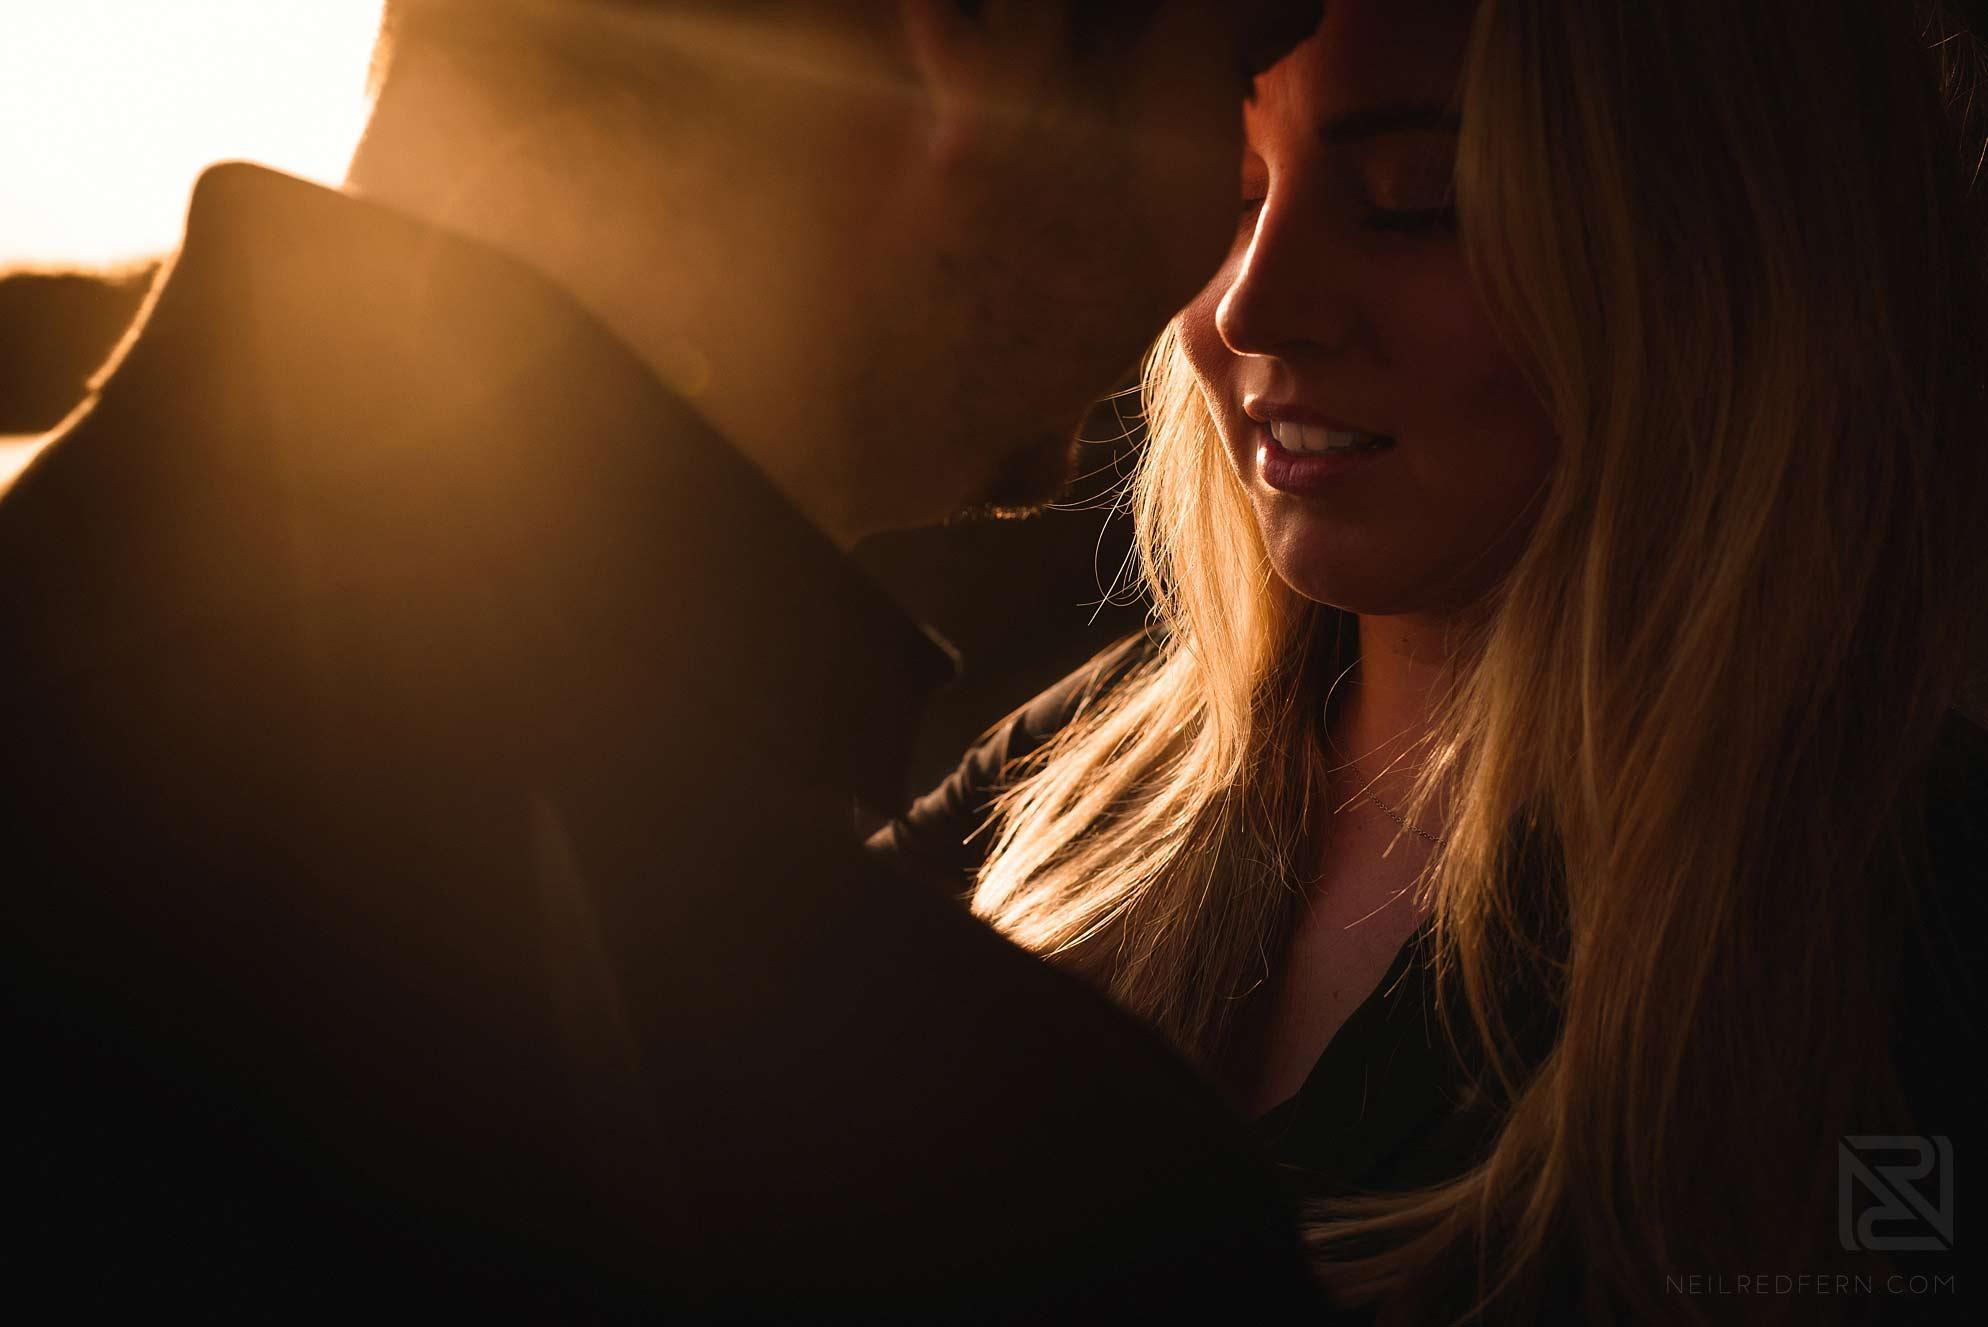 portrait of couple taken at sunset at Entwistle Reservoir